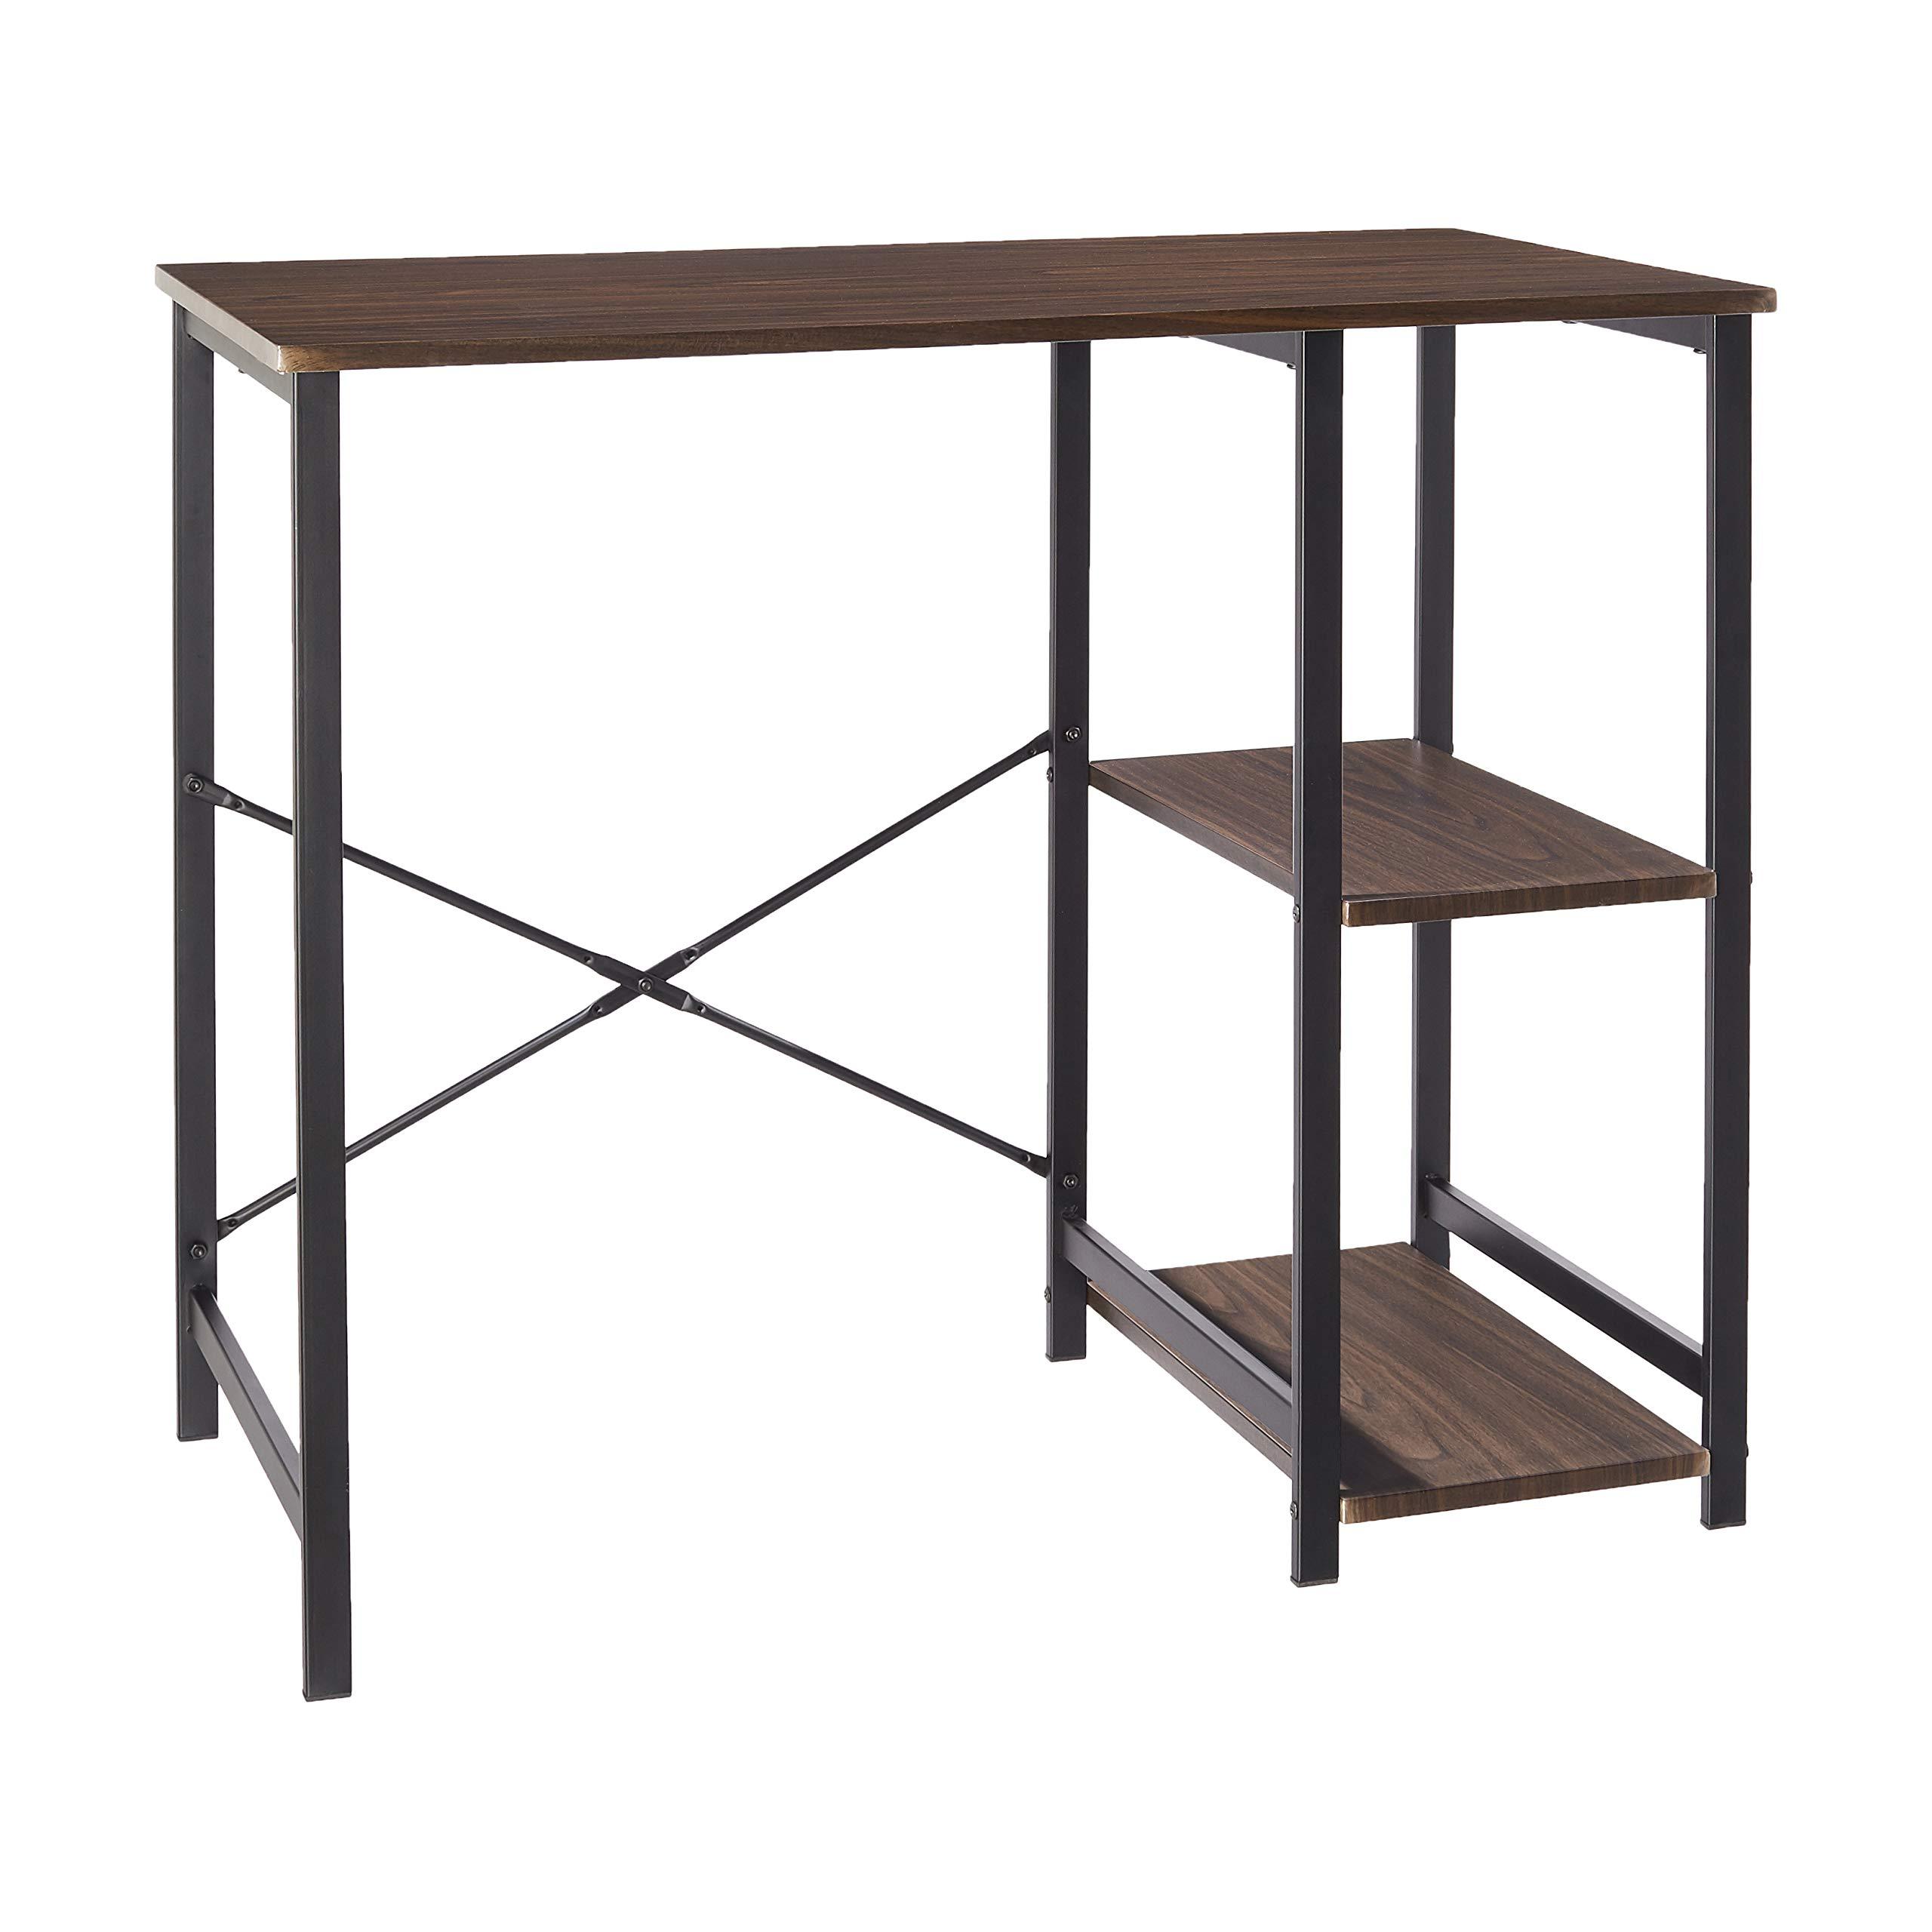 AmazonBasics Classic Computer Desk With Shelves - Espresso by AmazonBasics